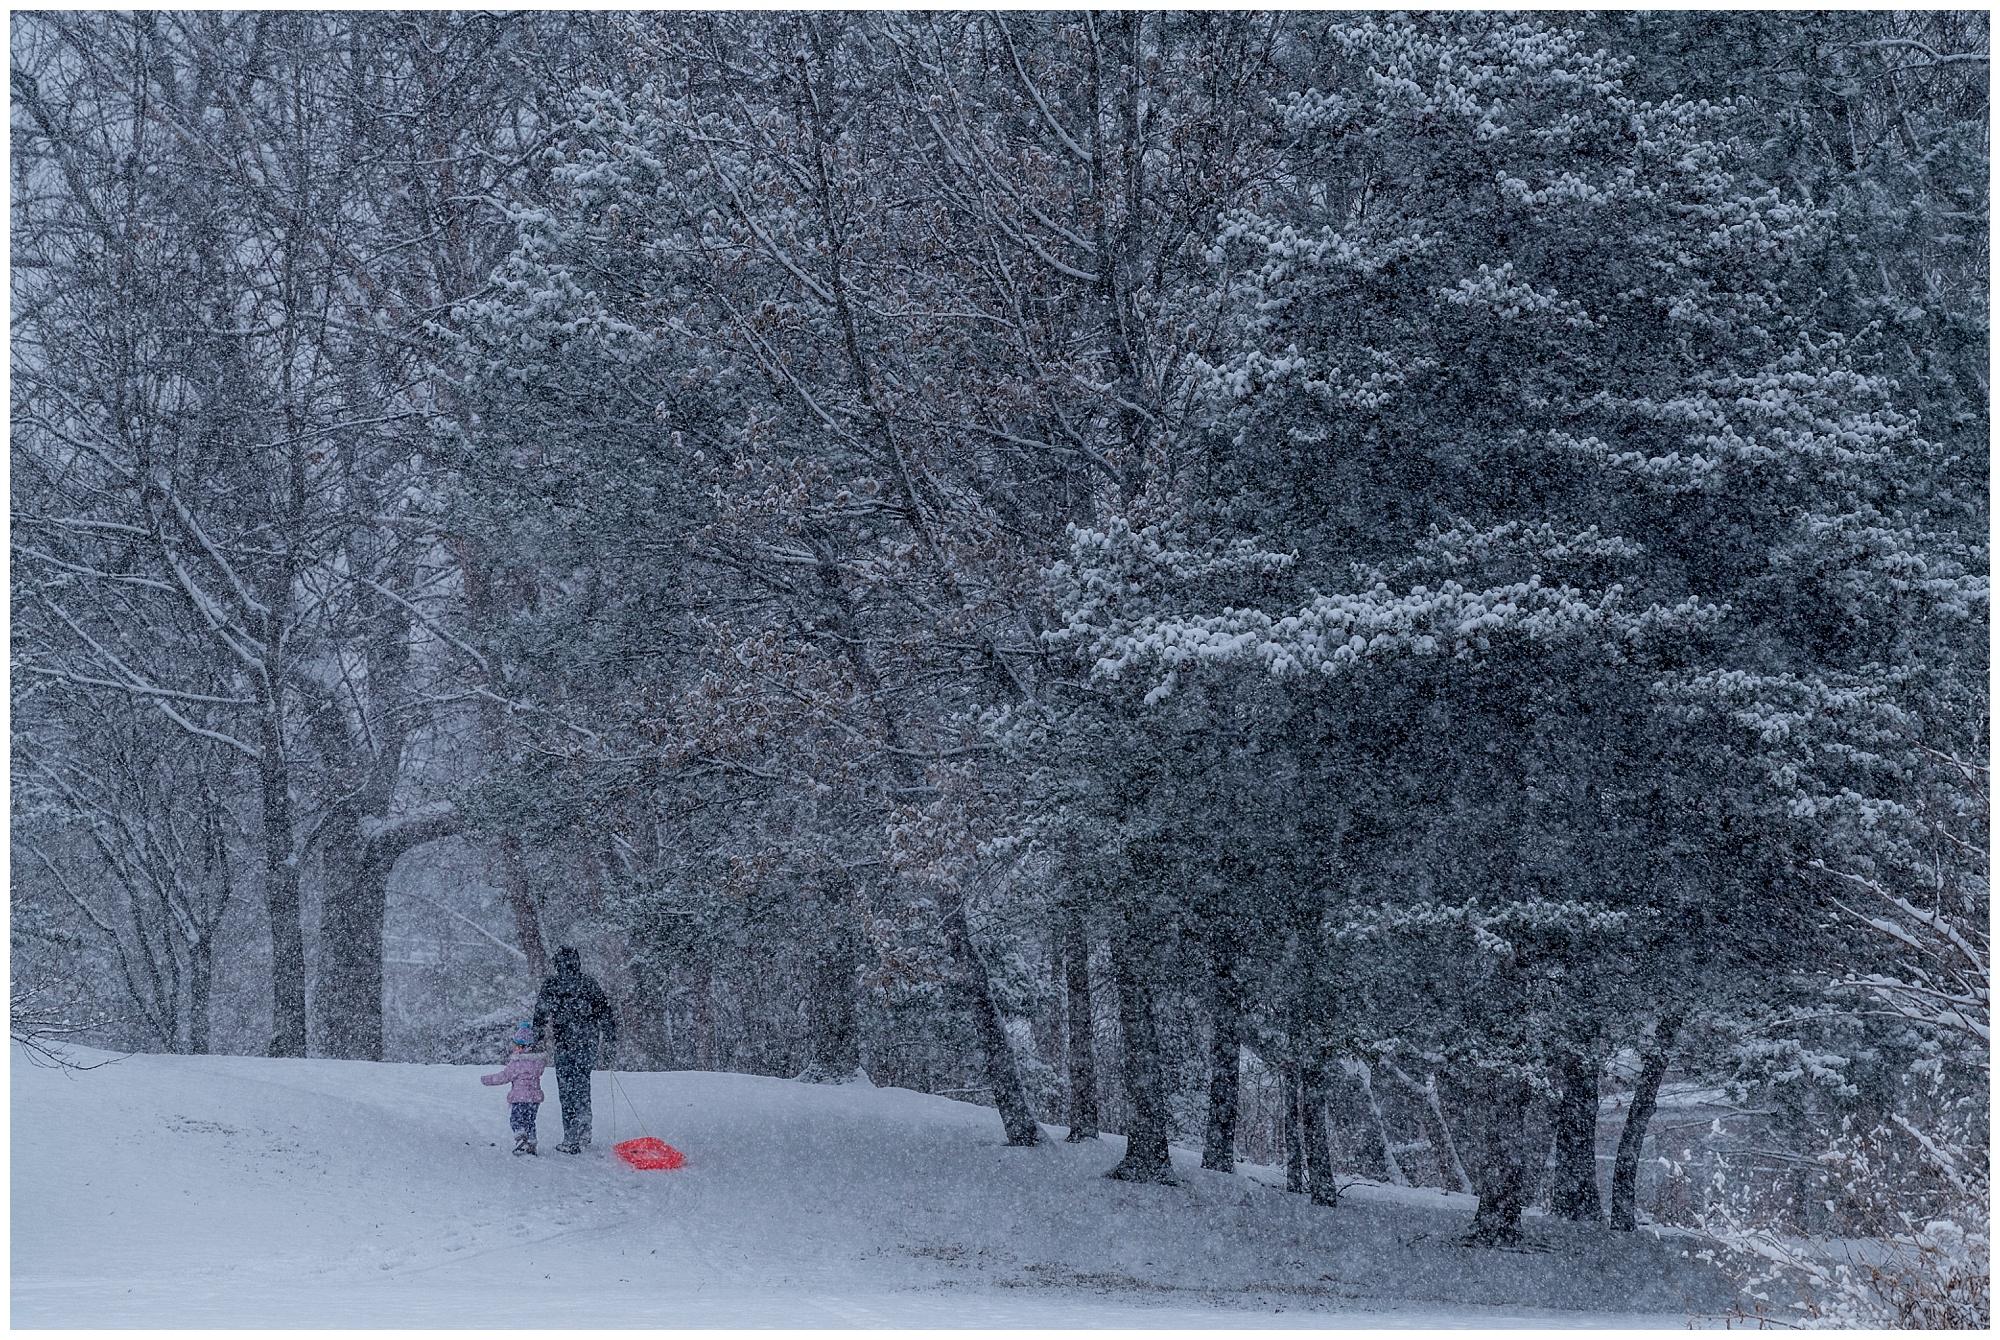 KielinskiPhotographers_snowday_gorgaspark_2018-01-01_0014.jpg